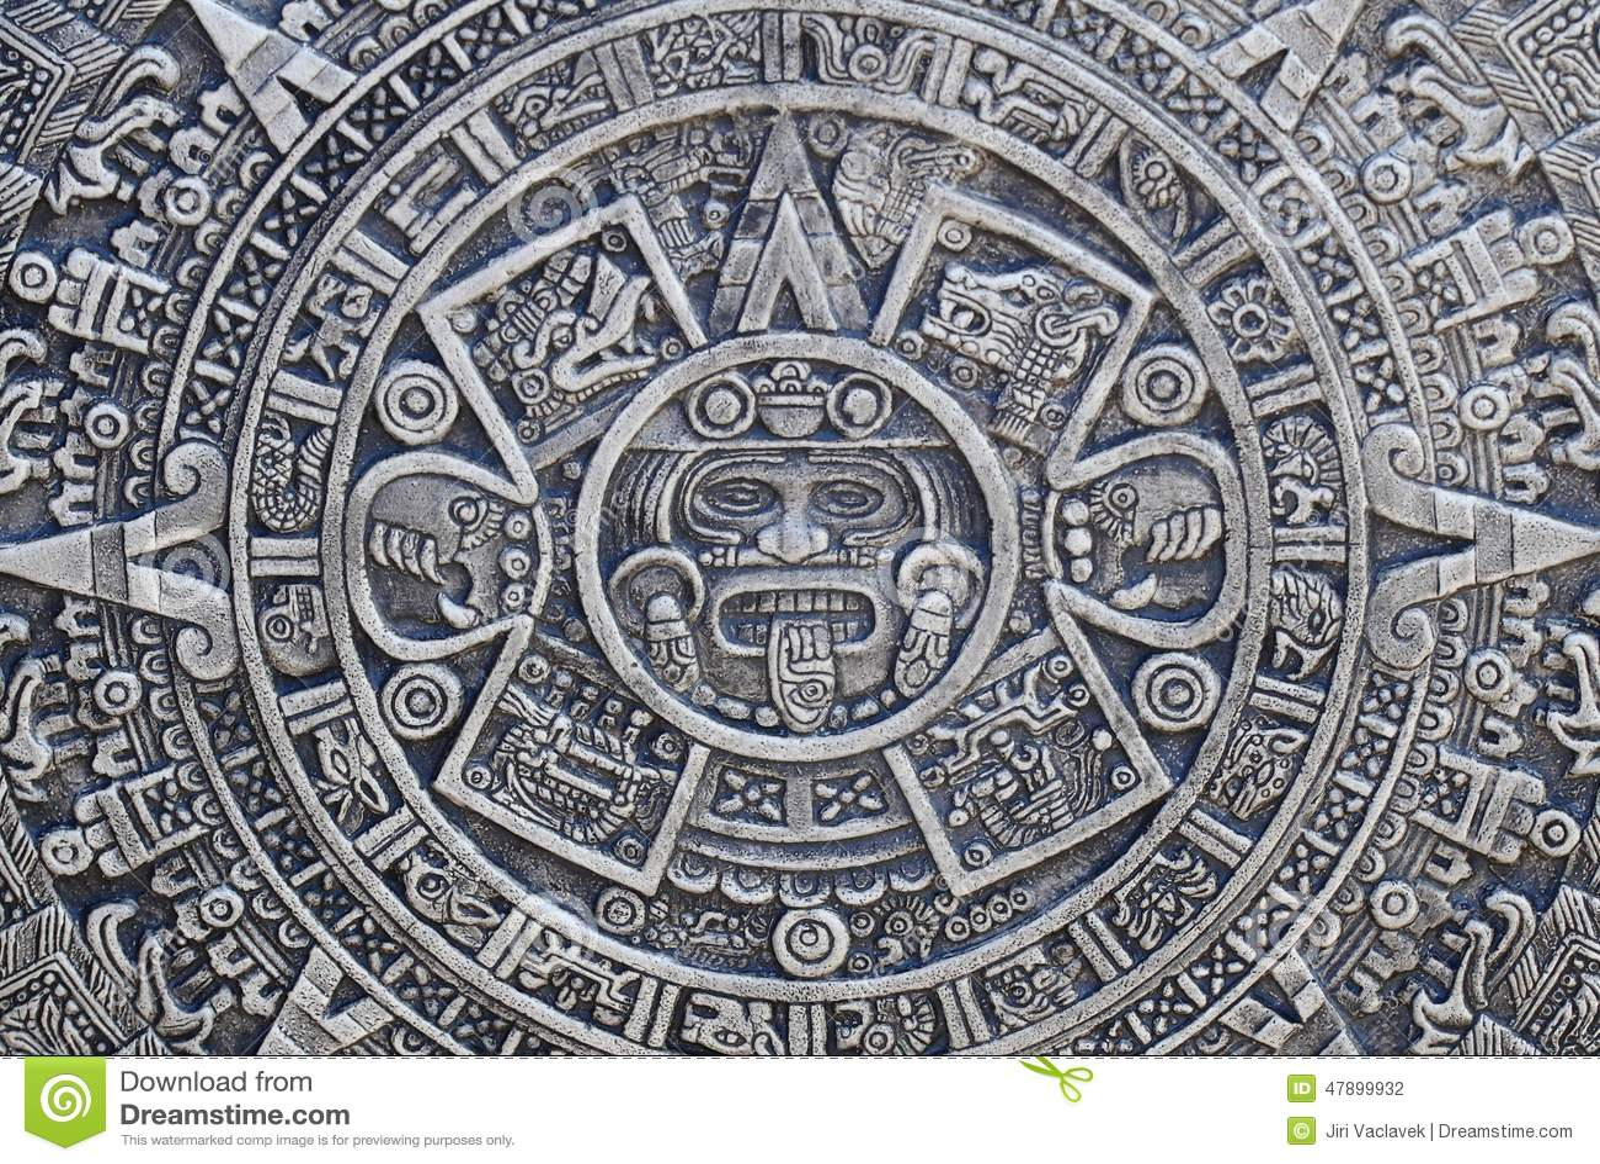 Aztec dating